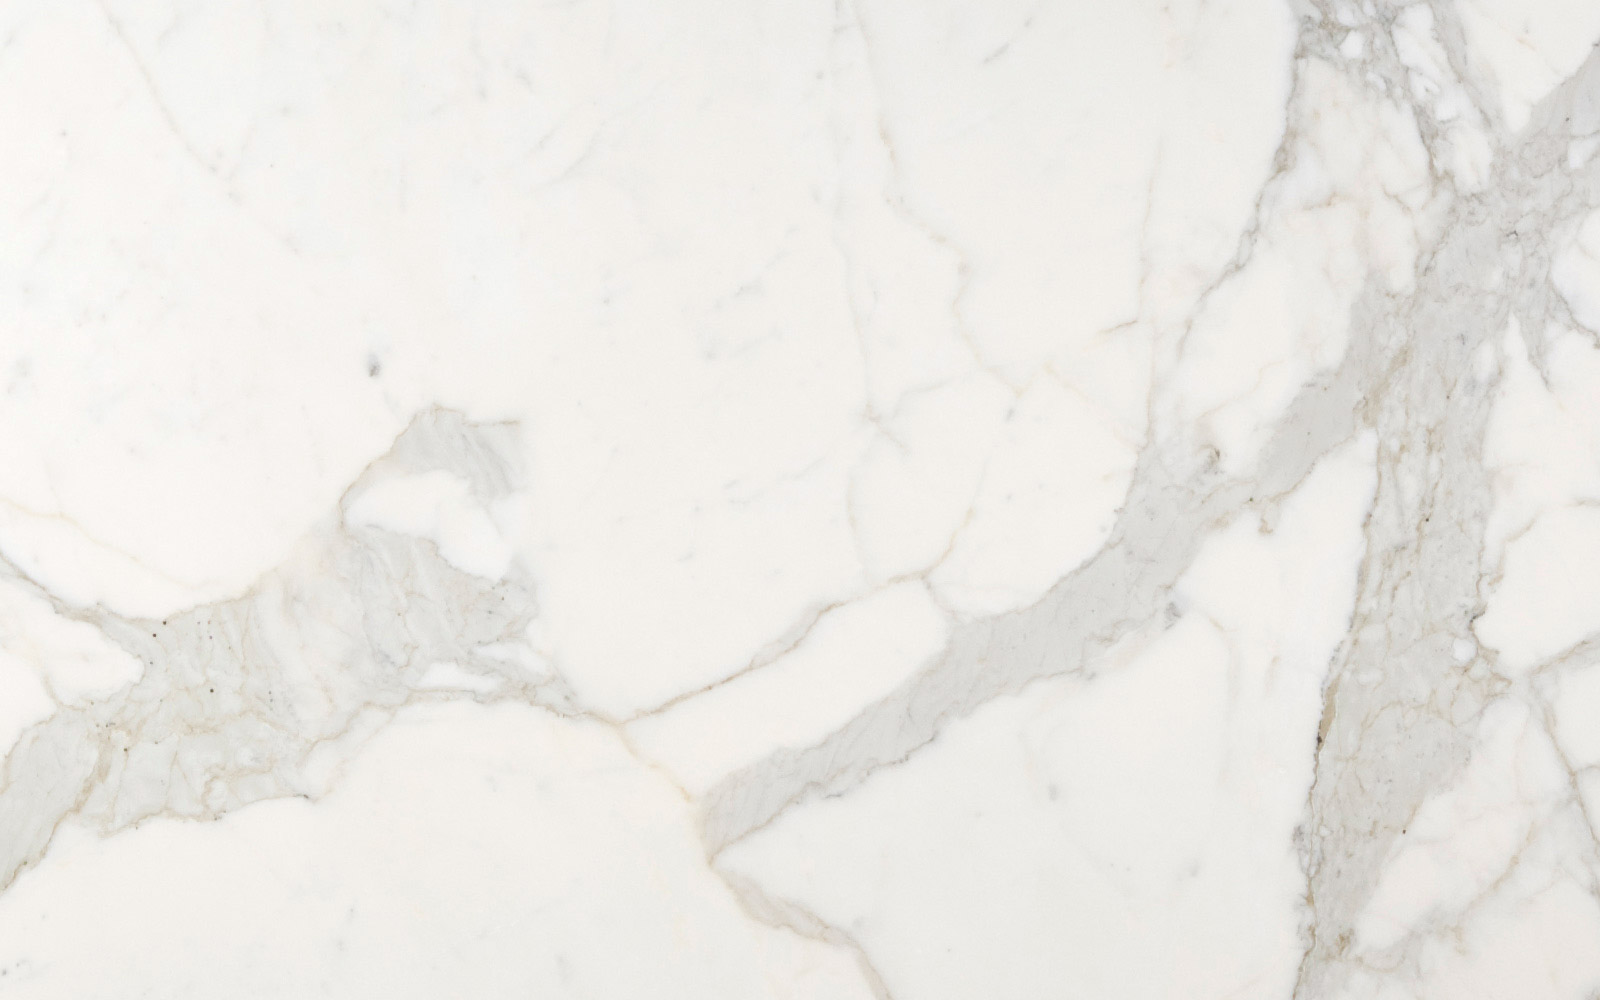 Calacatta Oro Marble Trend Marble Granite Tiles